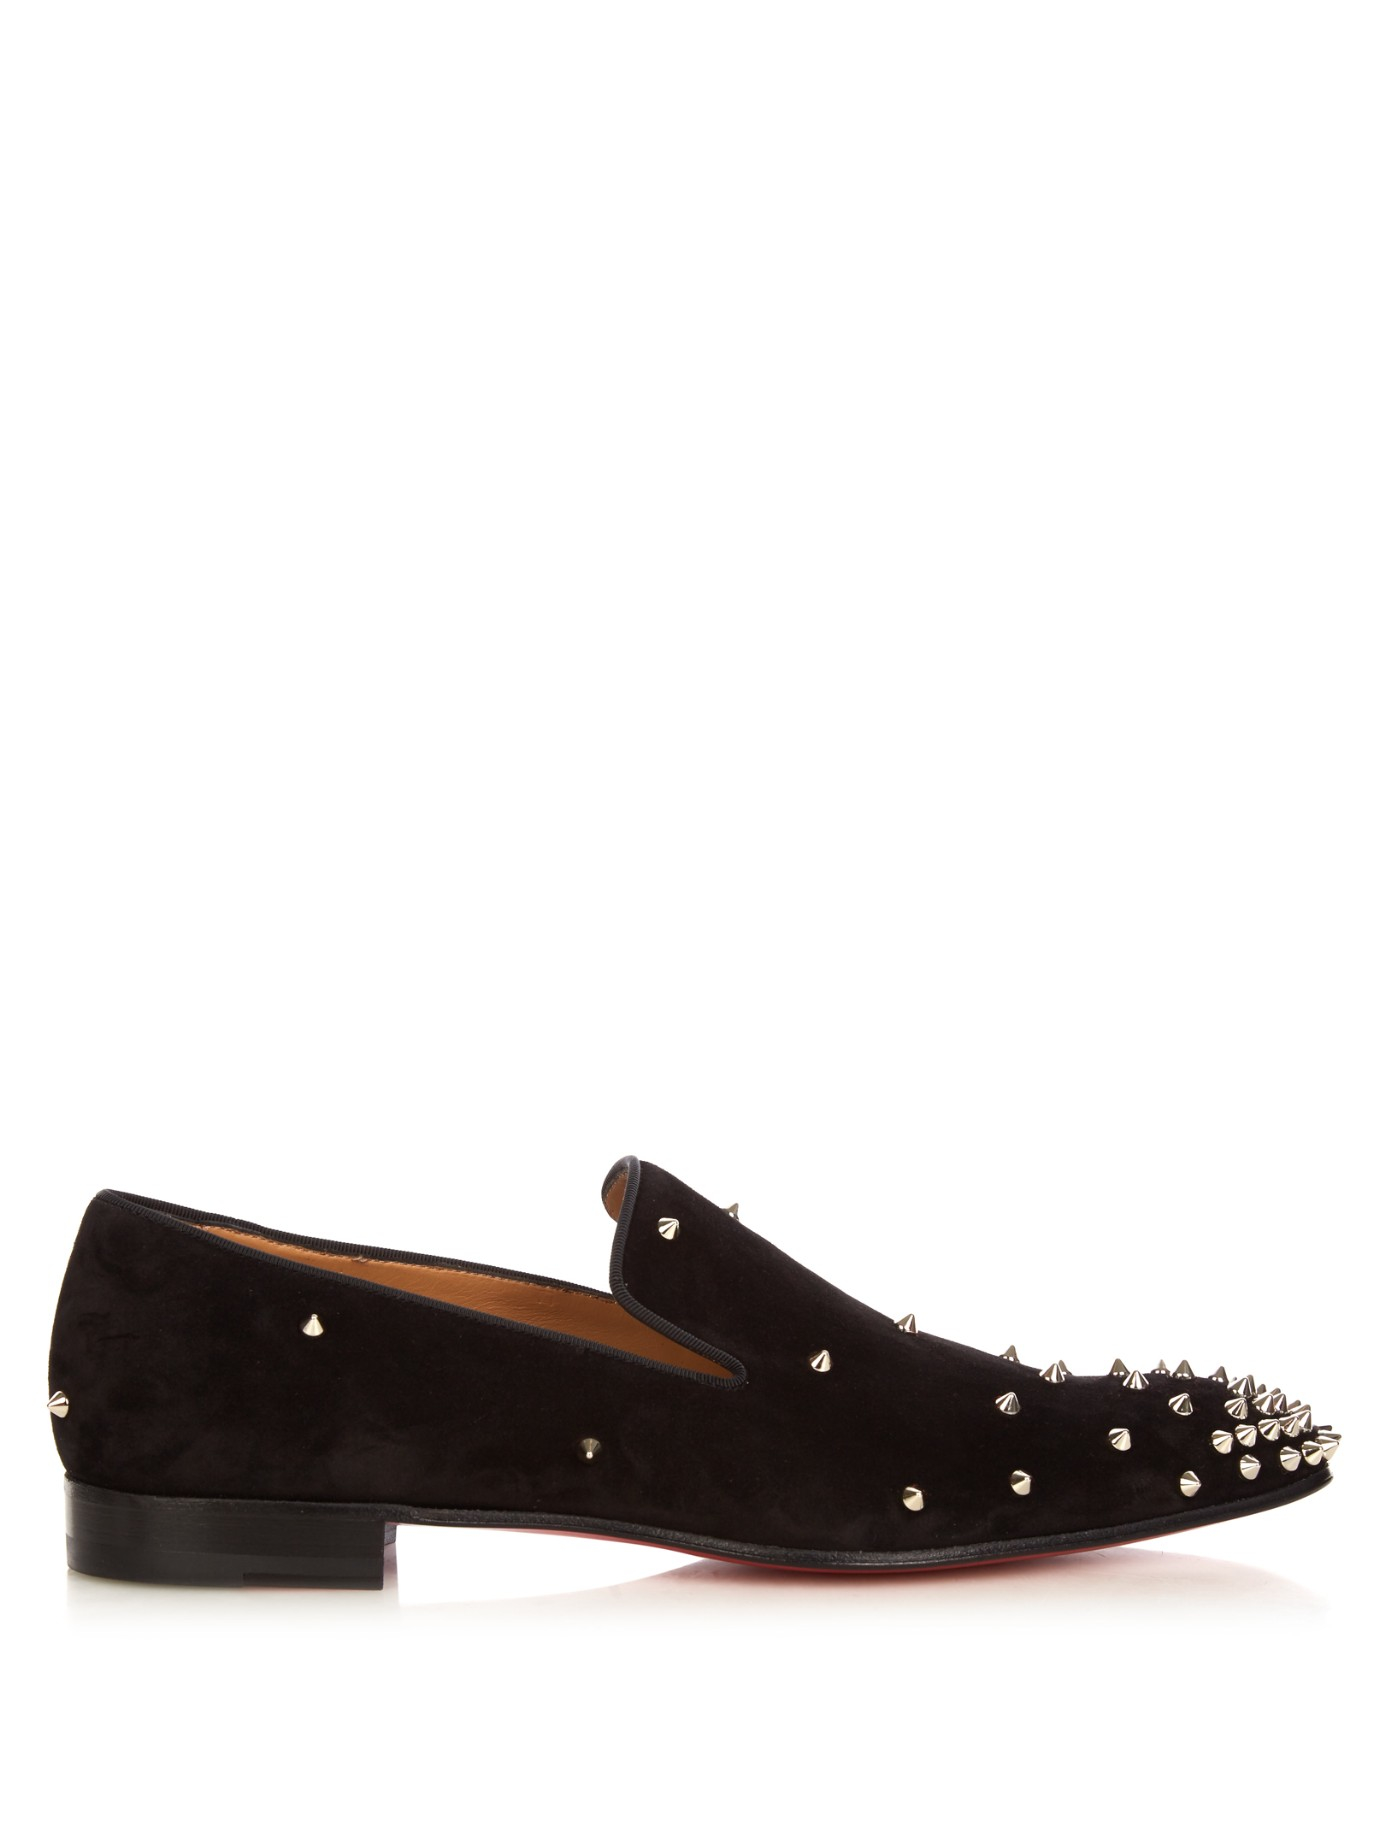 christian louboutin degra spike embellished slip on shoe